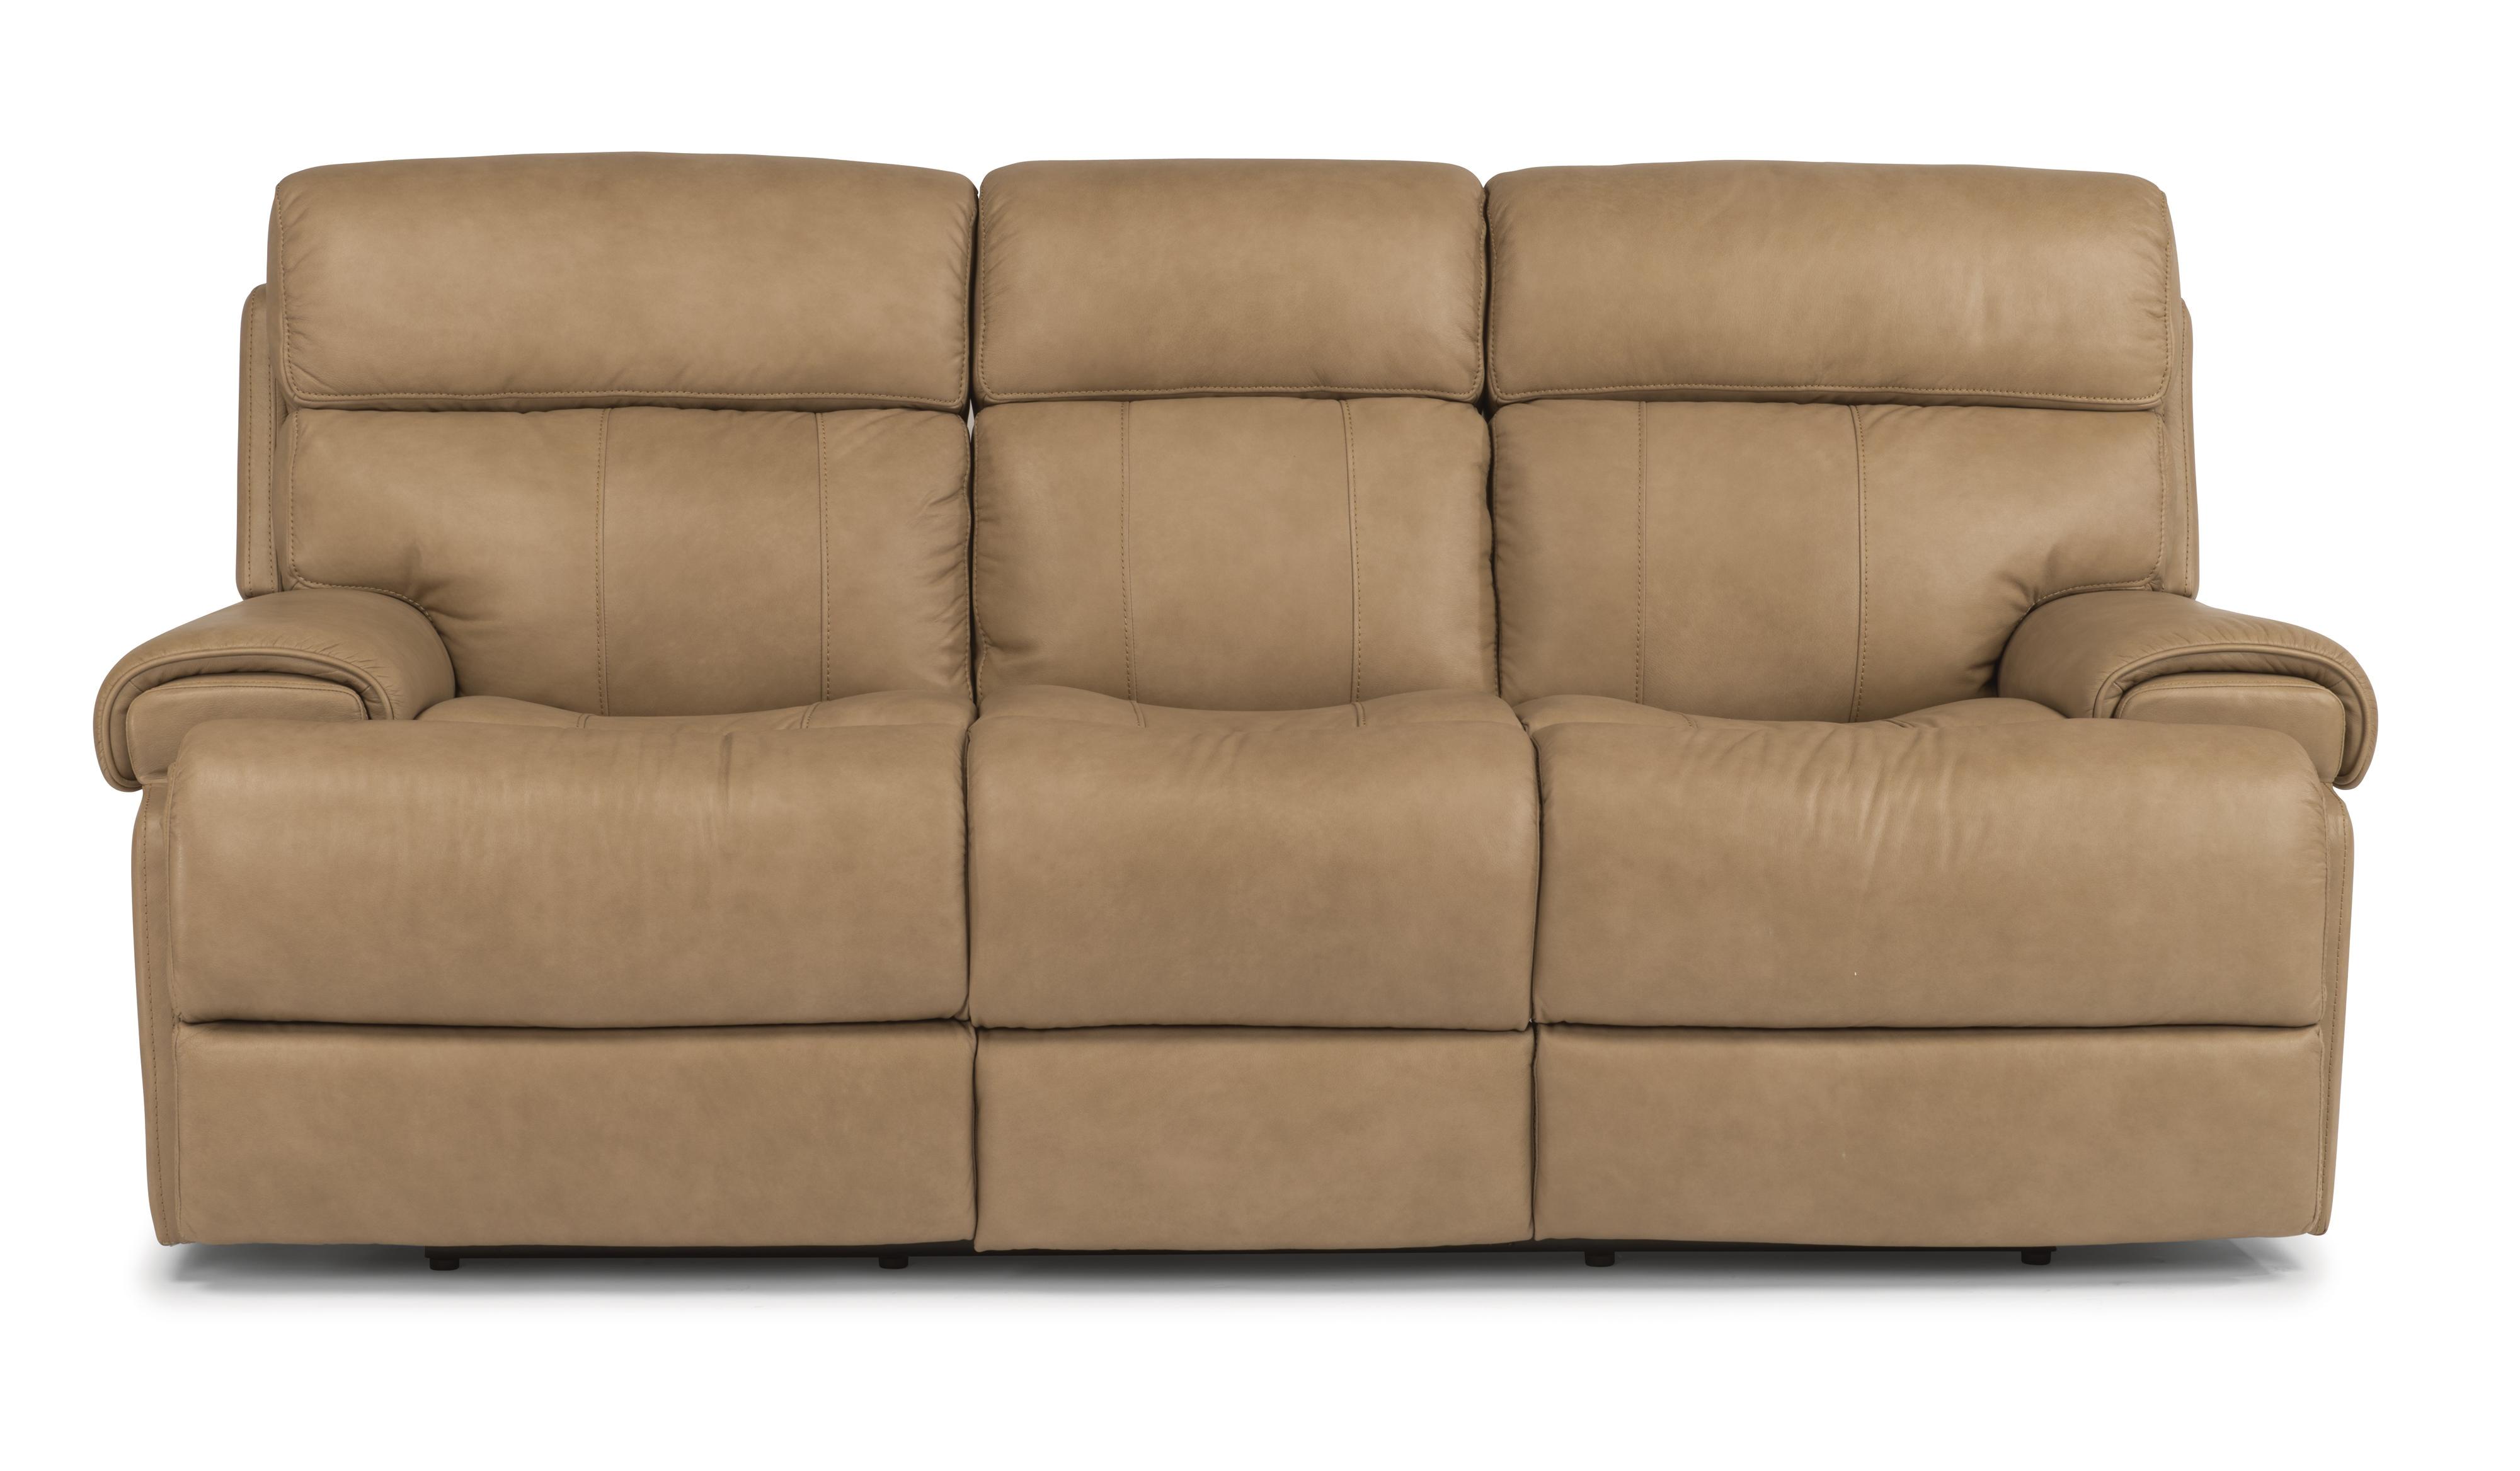 Flexsteel Latitudes Margot Power Reclining Sofa Item Number 1441 62P 832